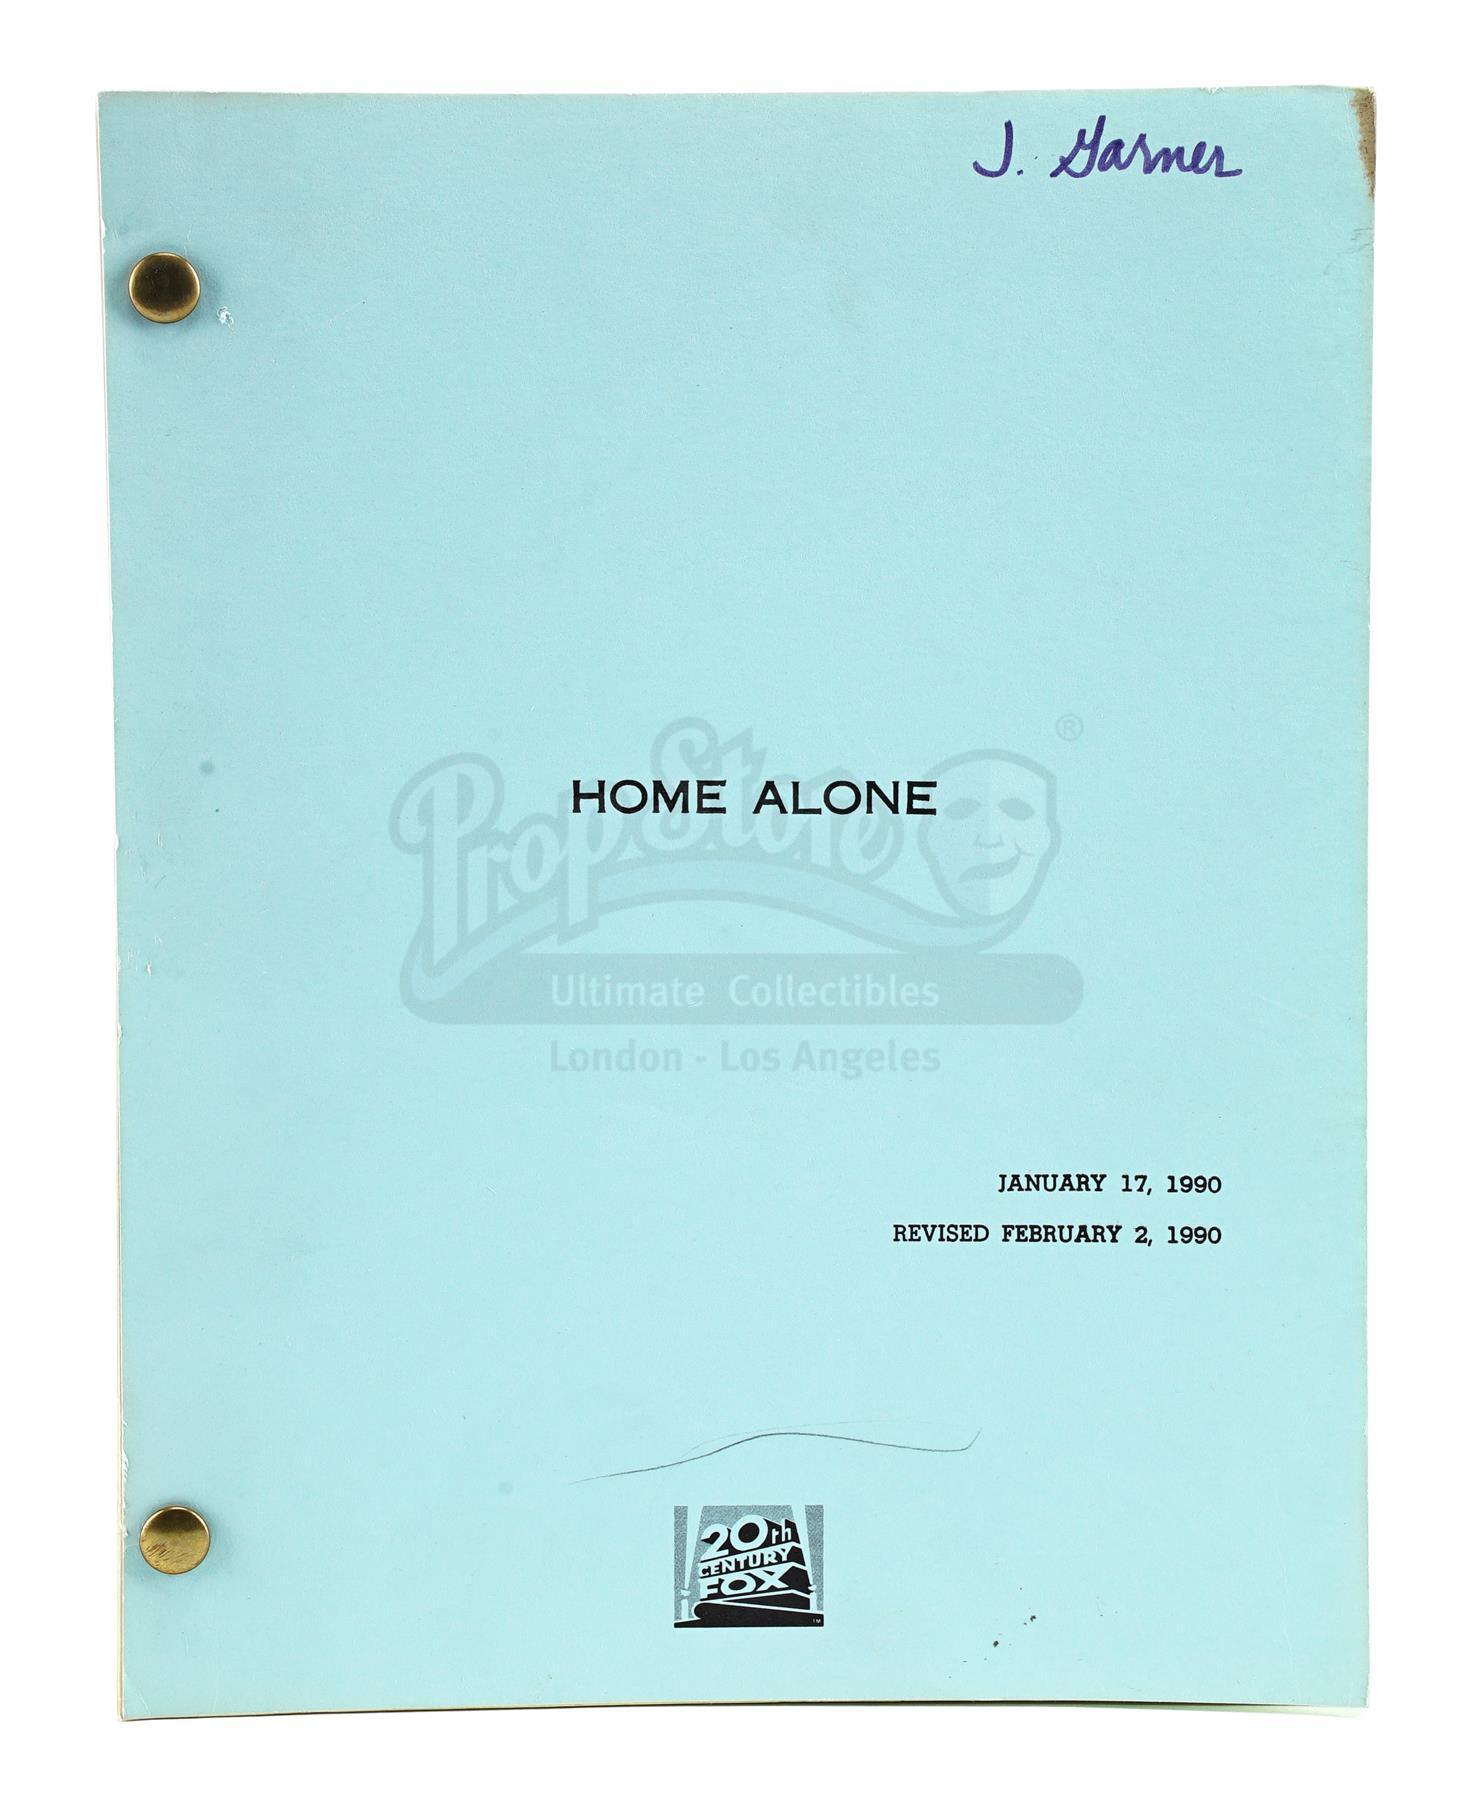 Lot # 737: HOME ALONE - Bound Revised Script